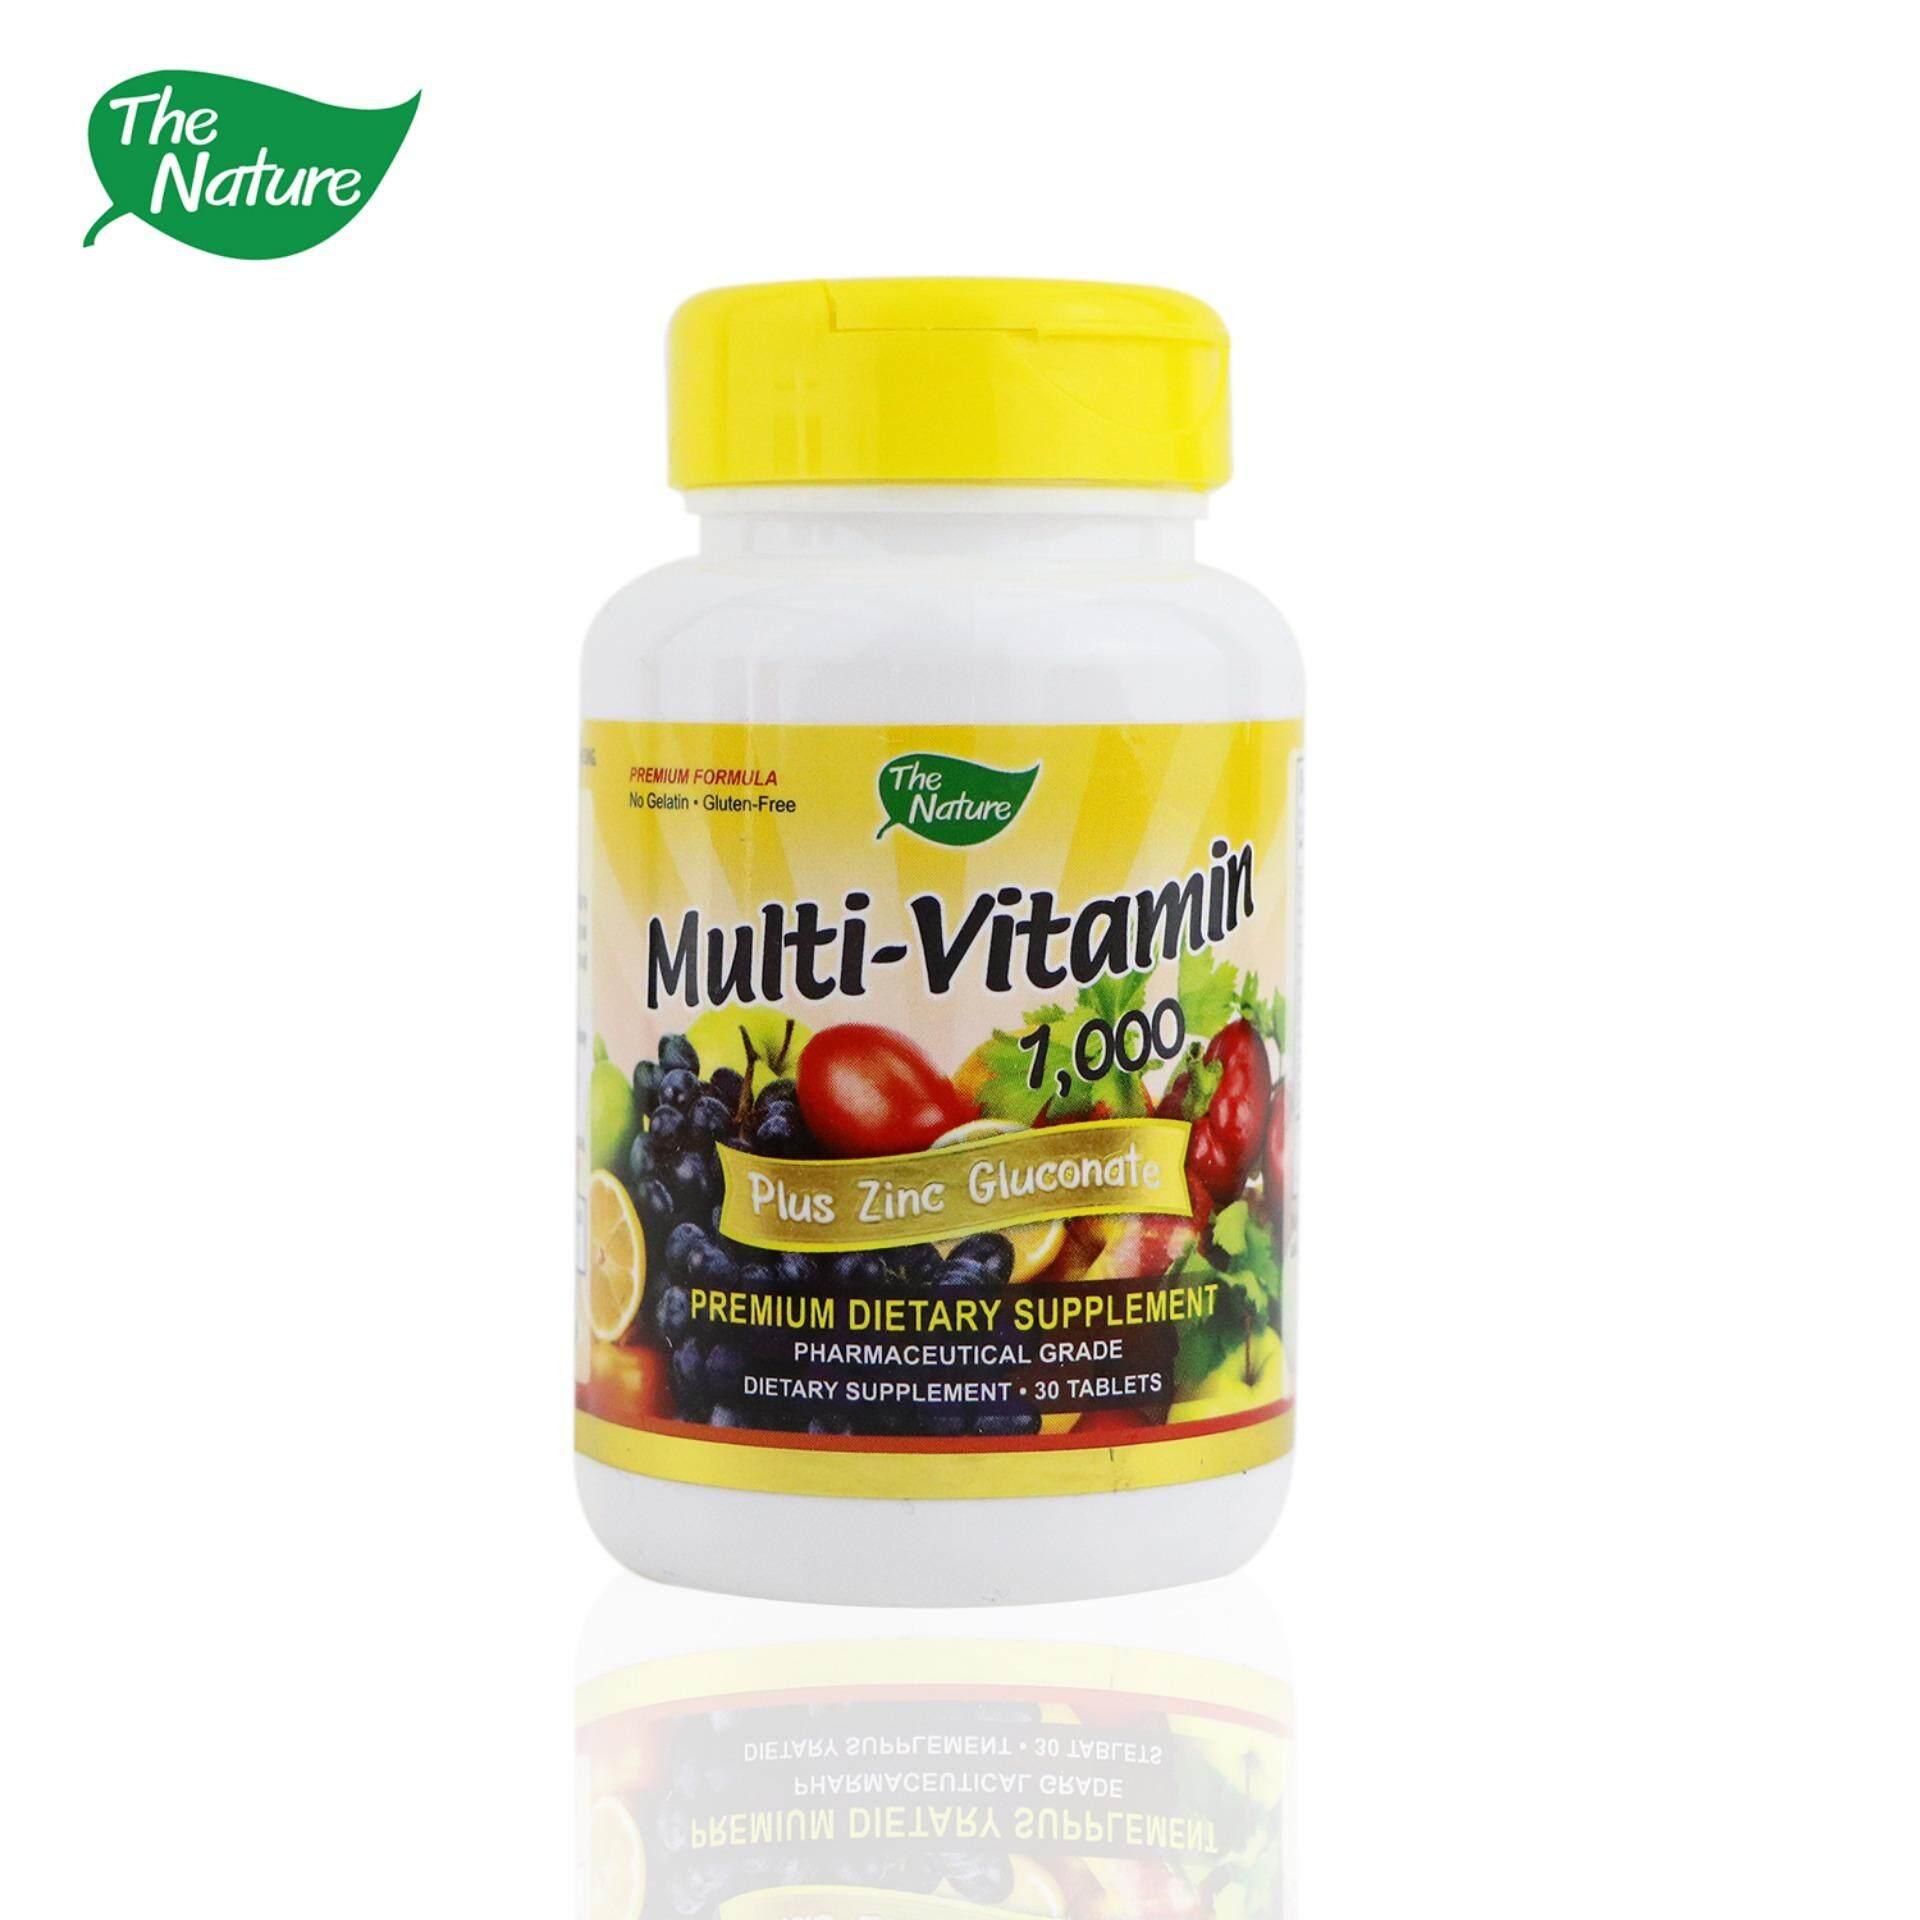 The Nature Multi Vitamin Plus Zinc มัลติ วิตามิน พลัส ซิงค์ เดอะ เนเจอร์